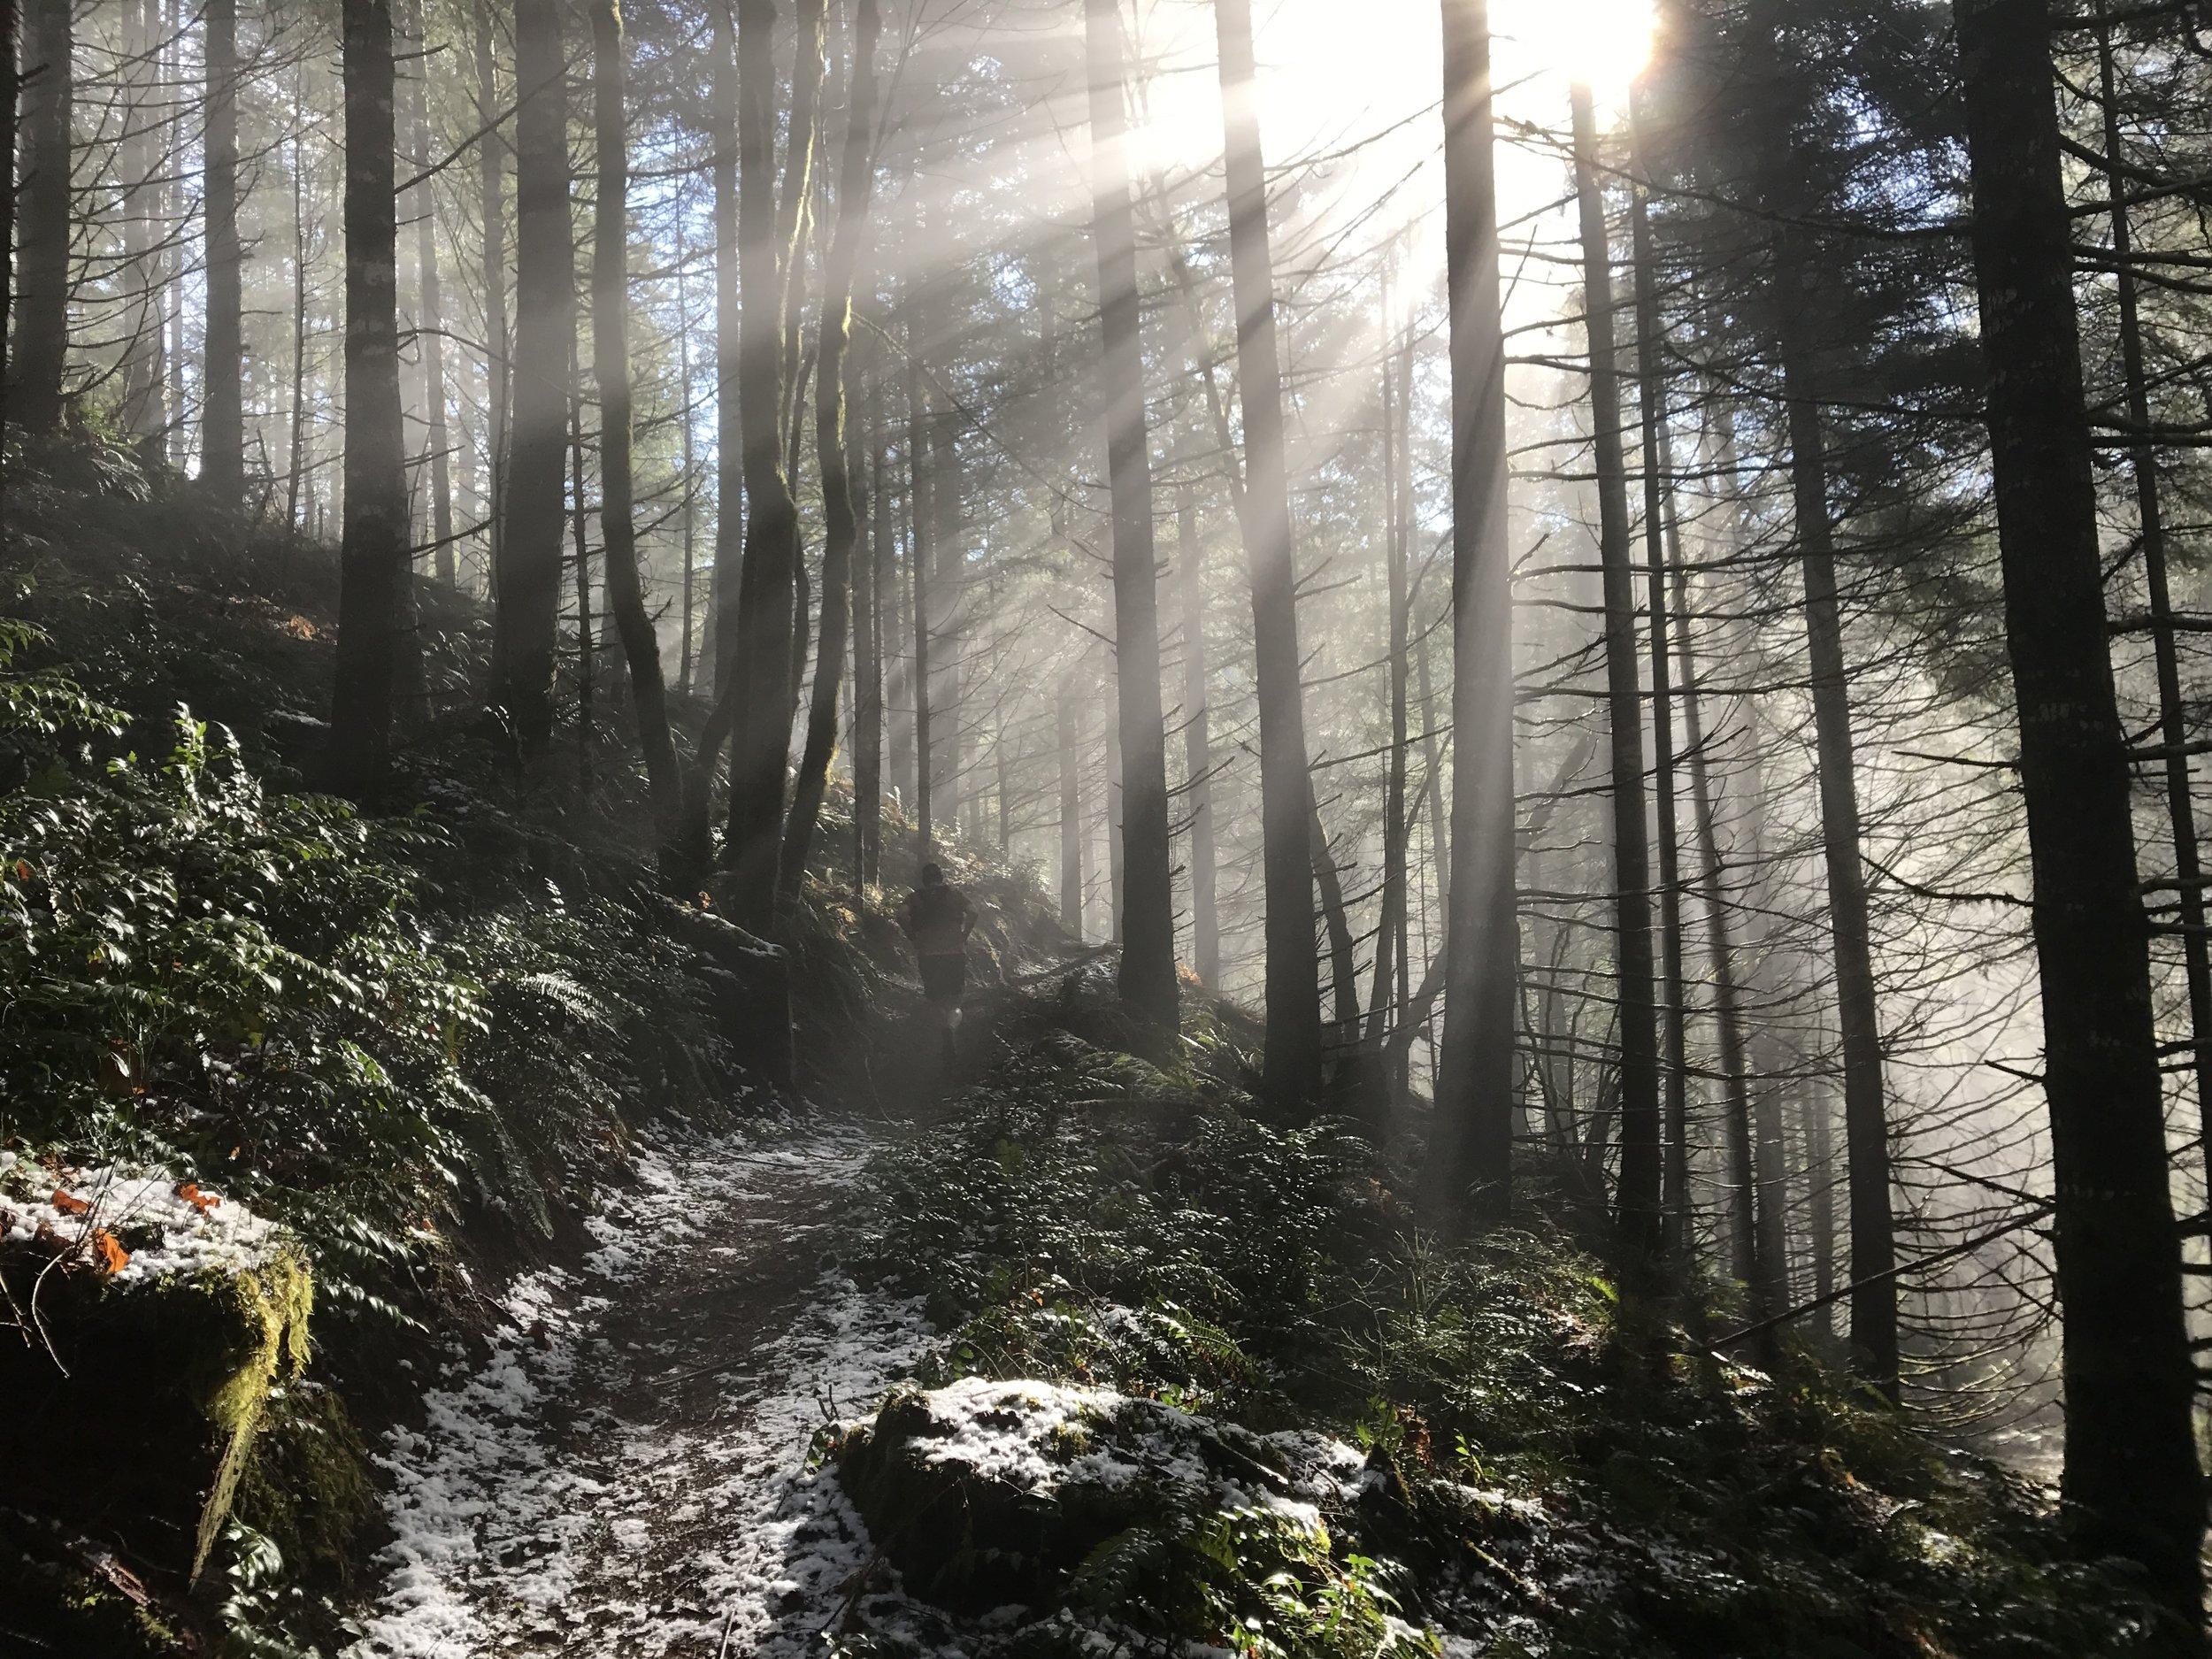 Green, sun, snow - Wilson River Trail - Tillamook